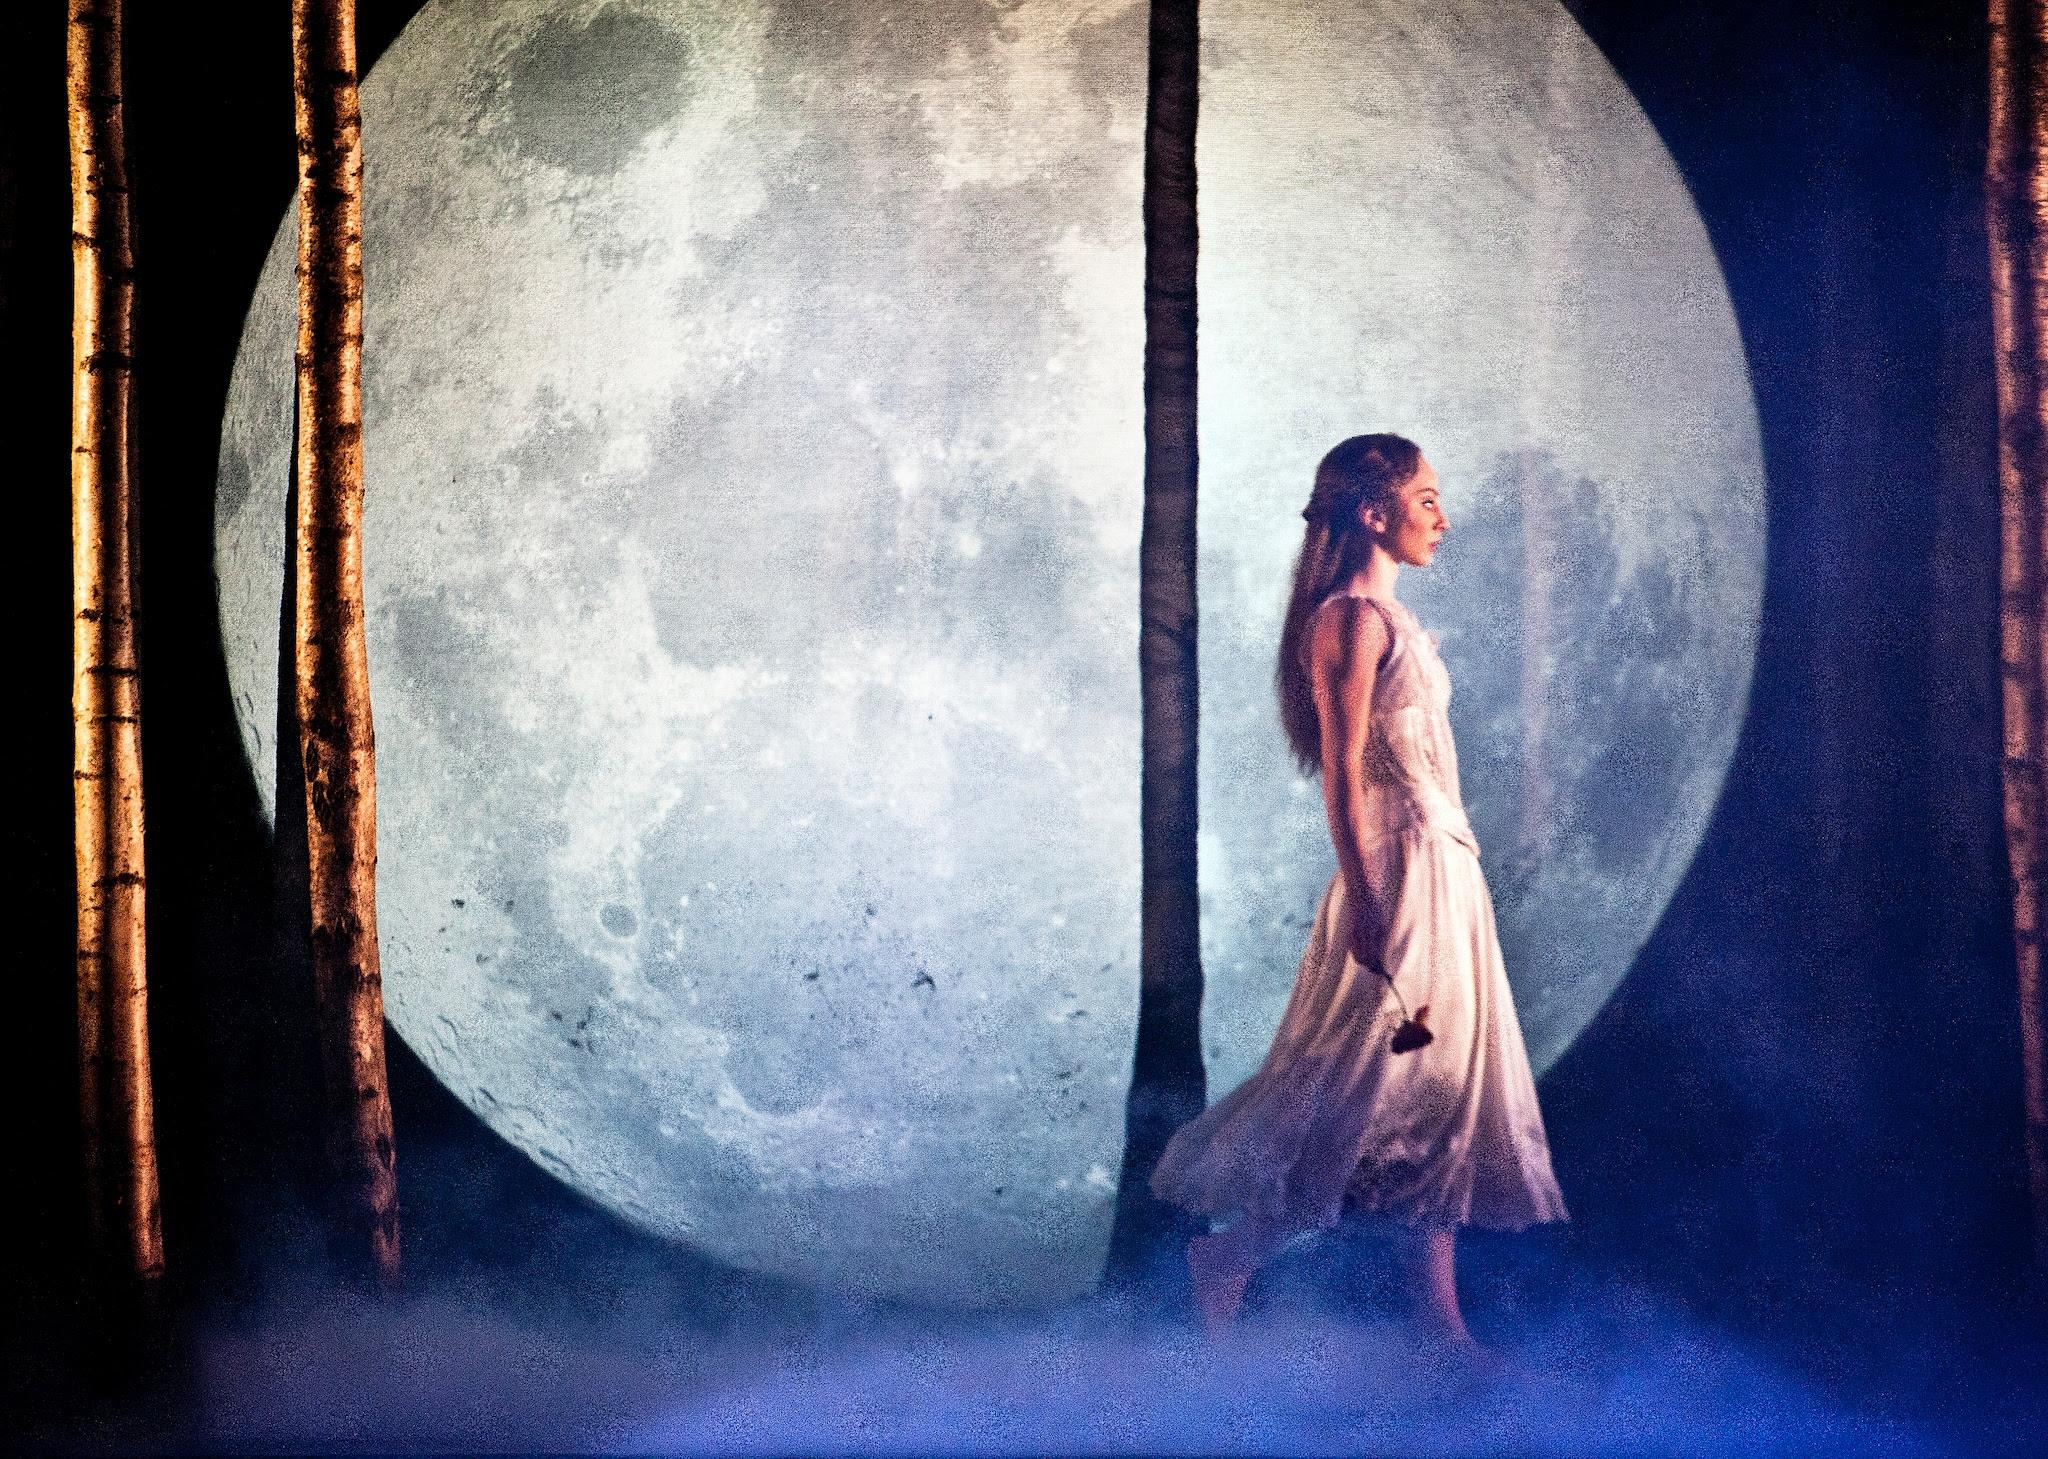 Matthew Bourne injects new energy into 'Sleeping Beauty' with ...